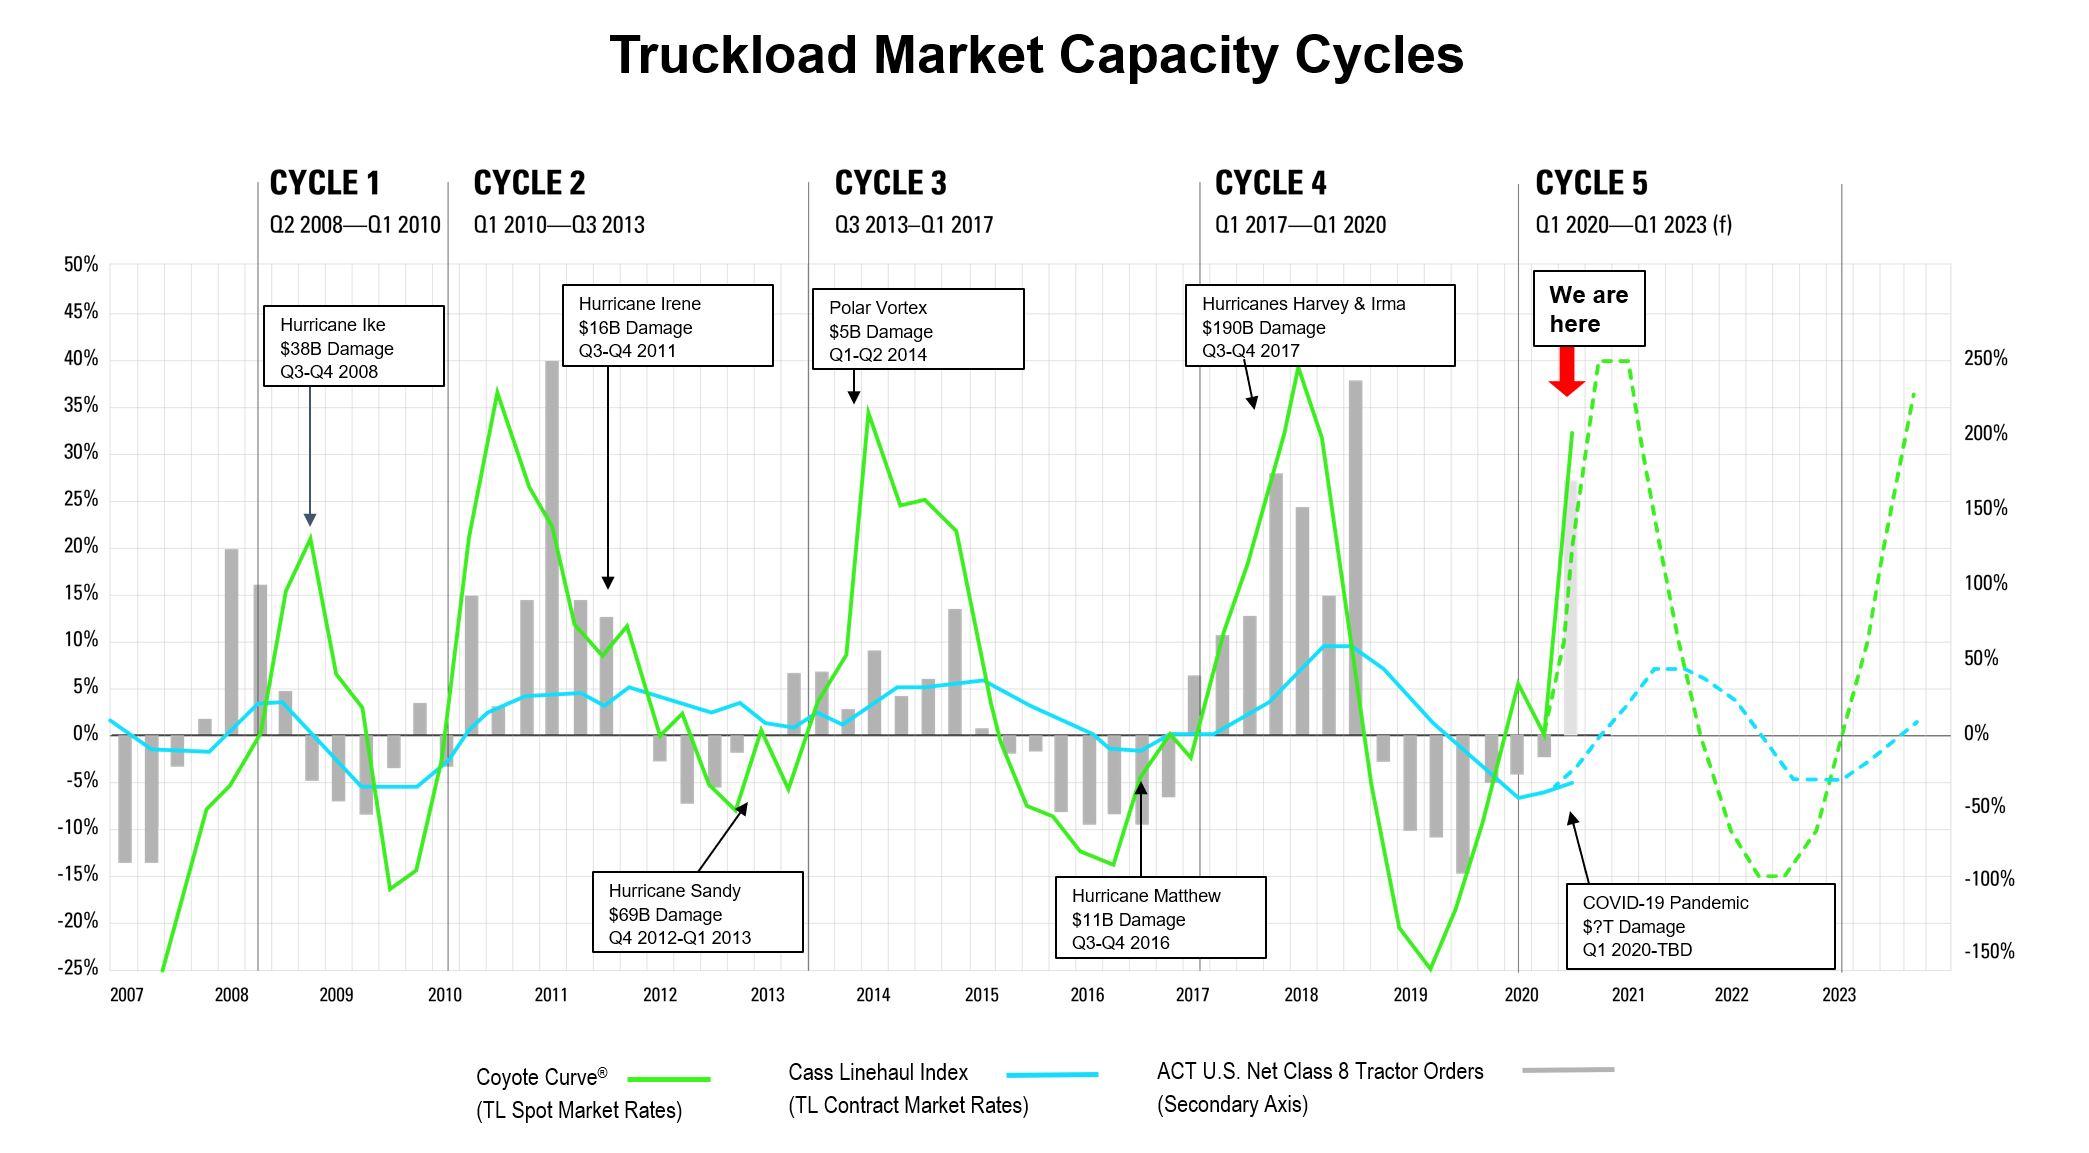 Q4 2020 Coyote Curve Market Forecast